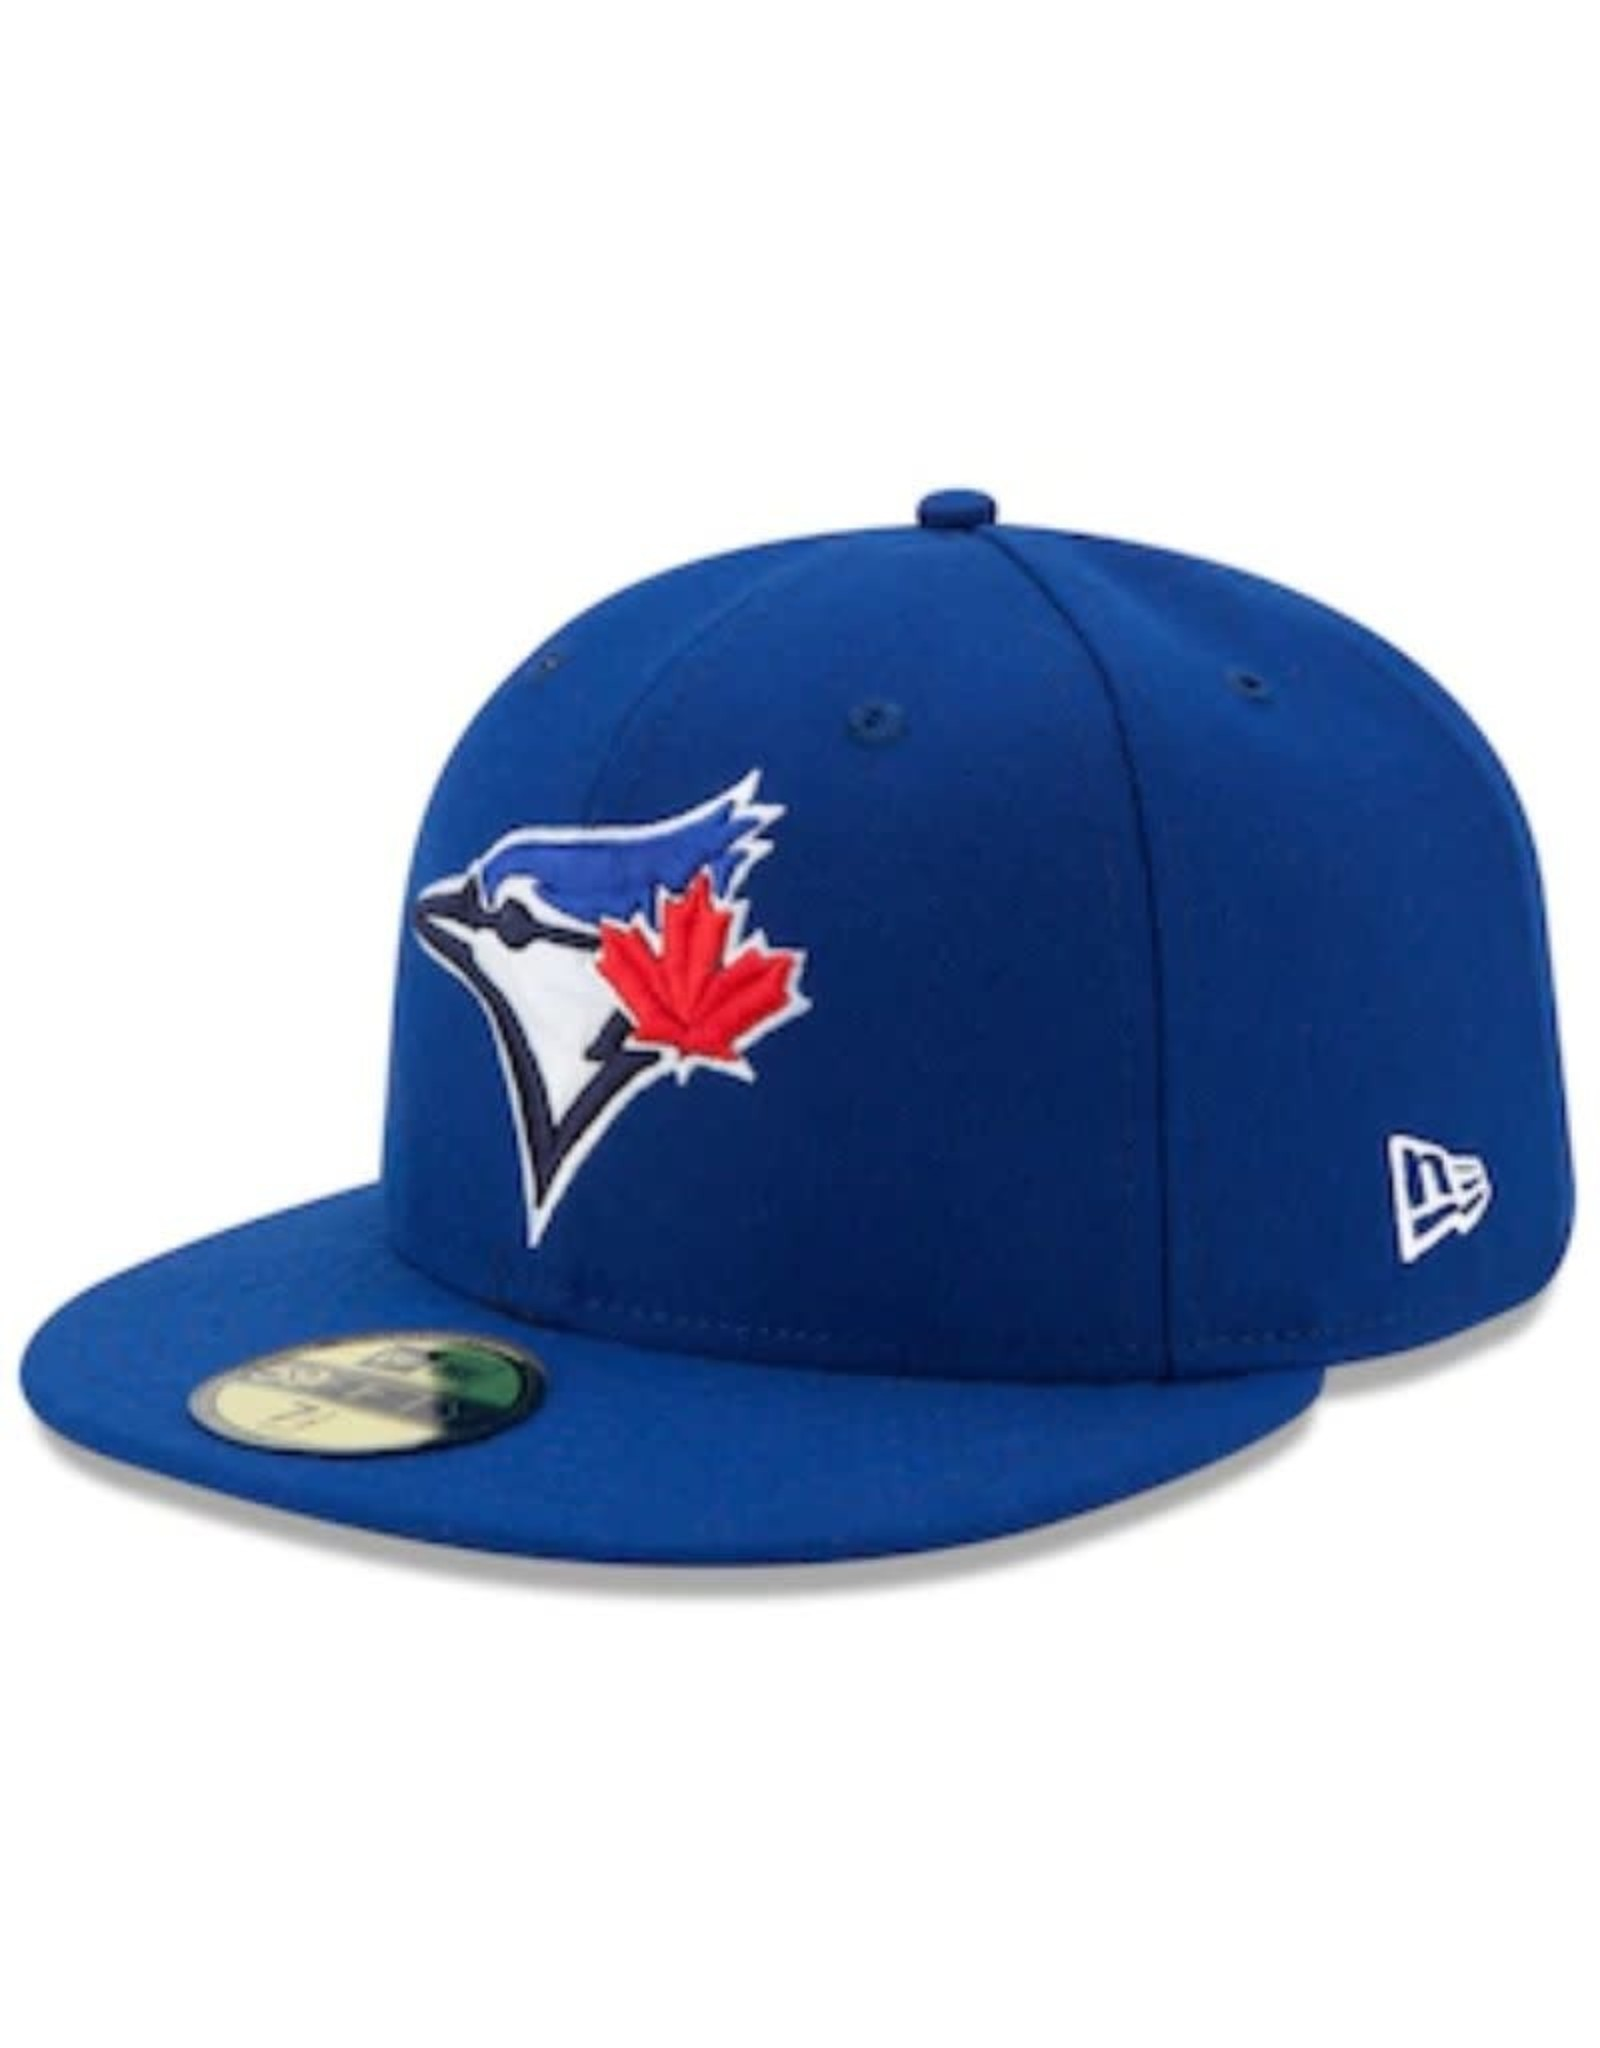 New Era on-field home hat Toronto Blue Jays